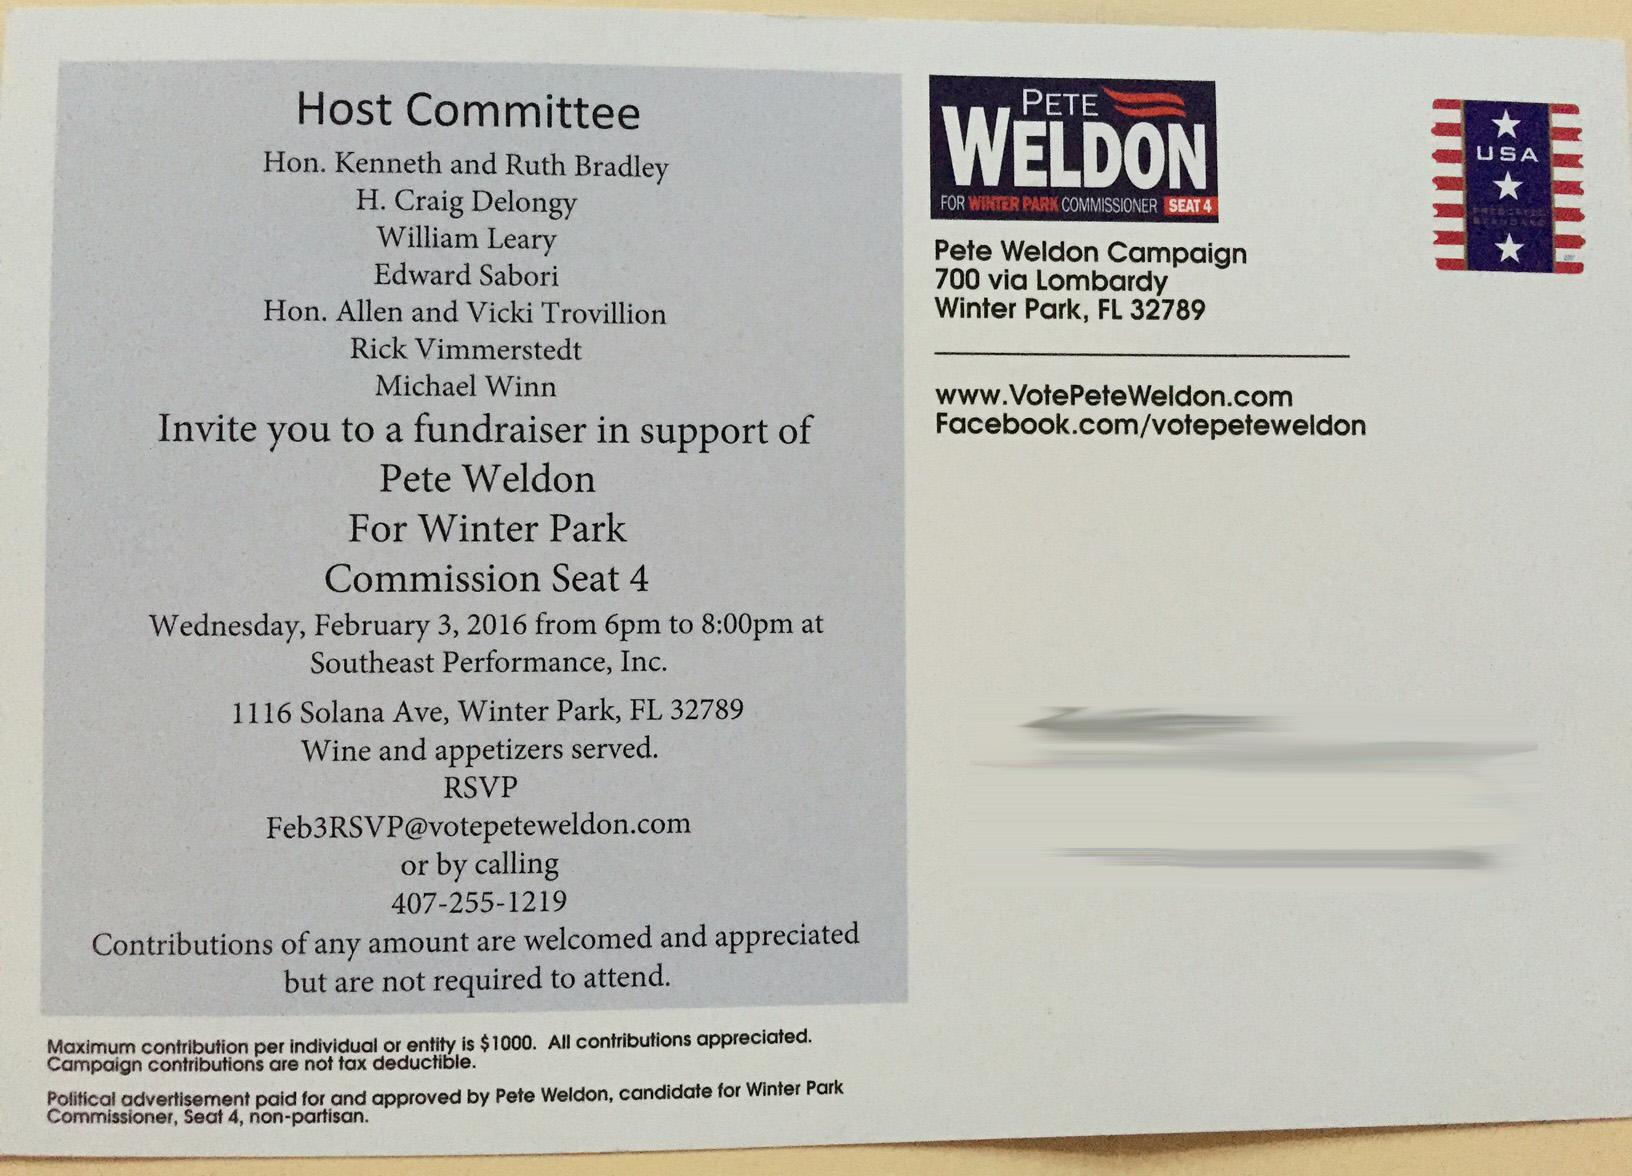 weldon-05